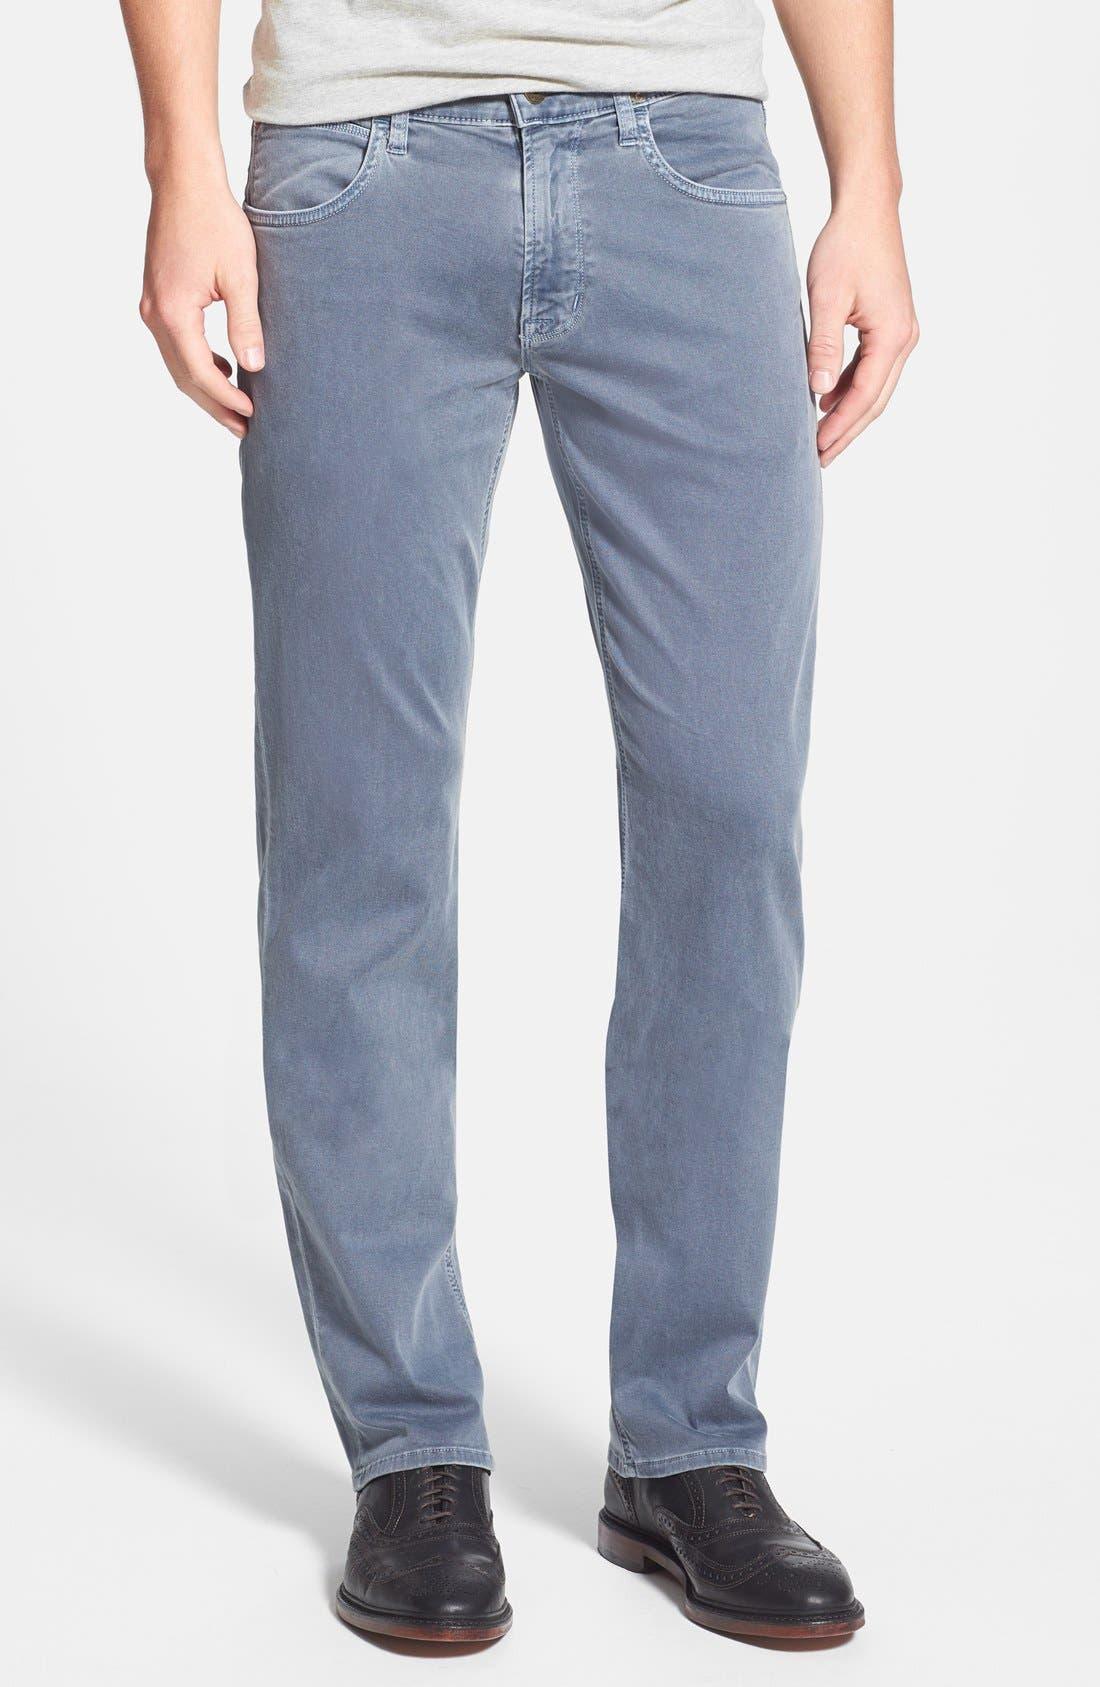 Alternate Image 1 Selected - Hudson Jeans 'Byron' Straight Leg Jeans (Sunfaded Petrol)